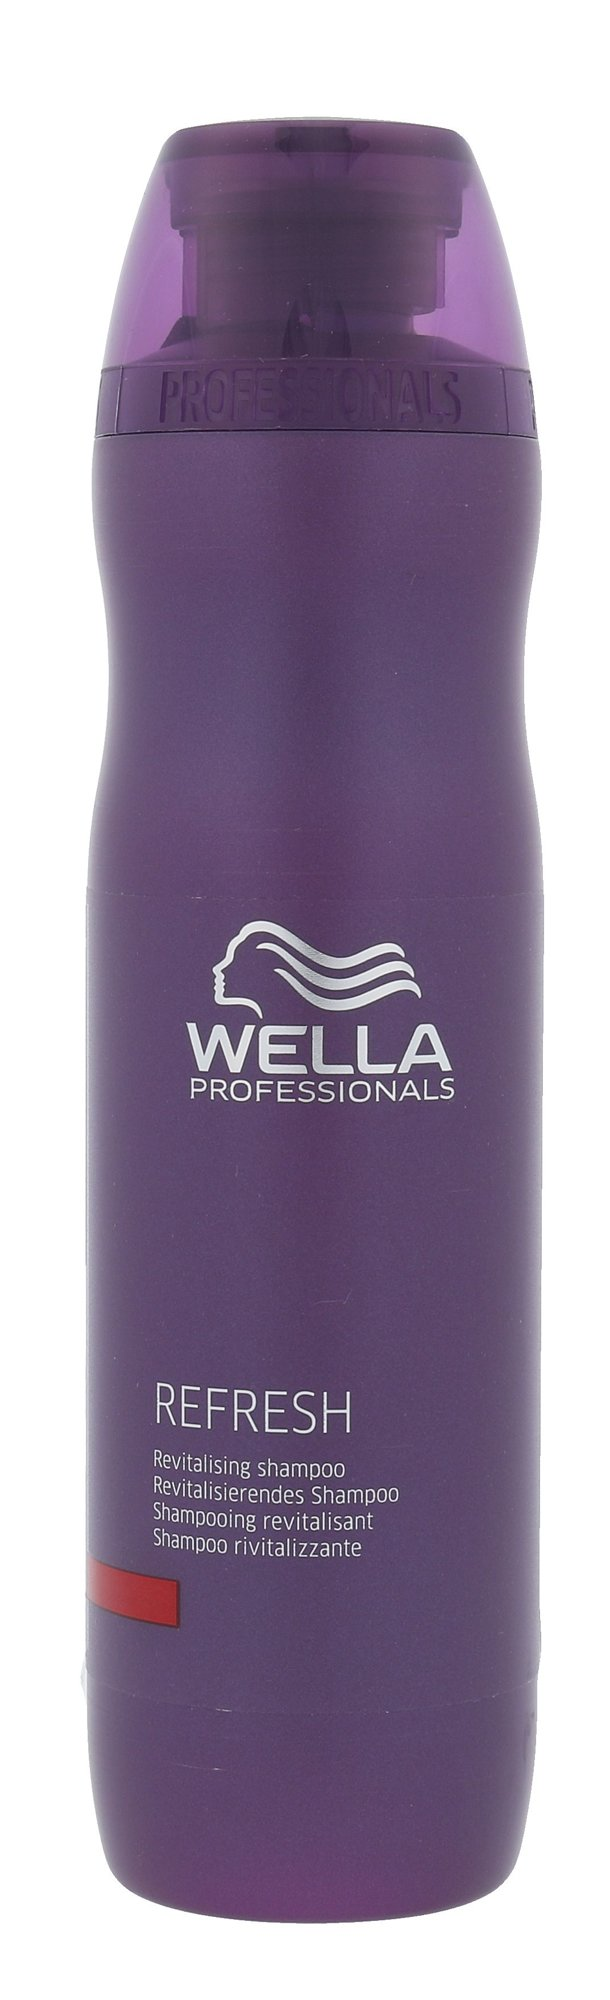 Wella Refresh Cosmetic 250ml